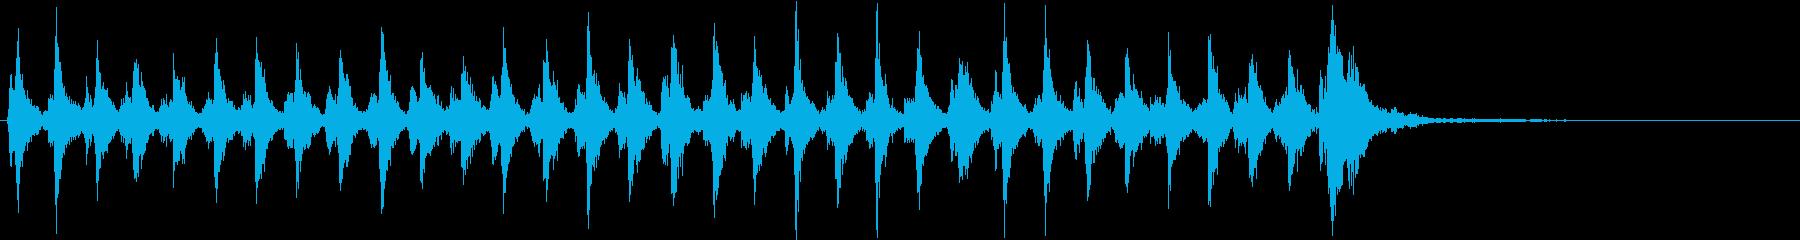 Xmasに最適トナカイベルのループ音01の再生済みの波形